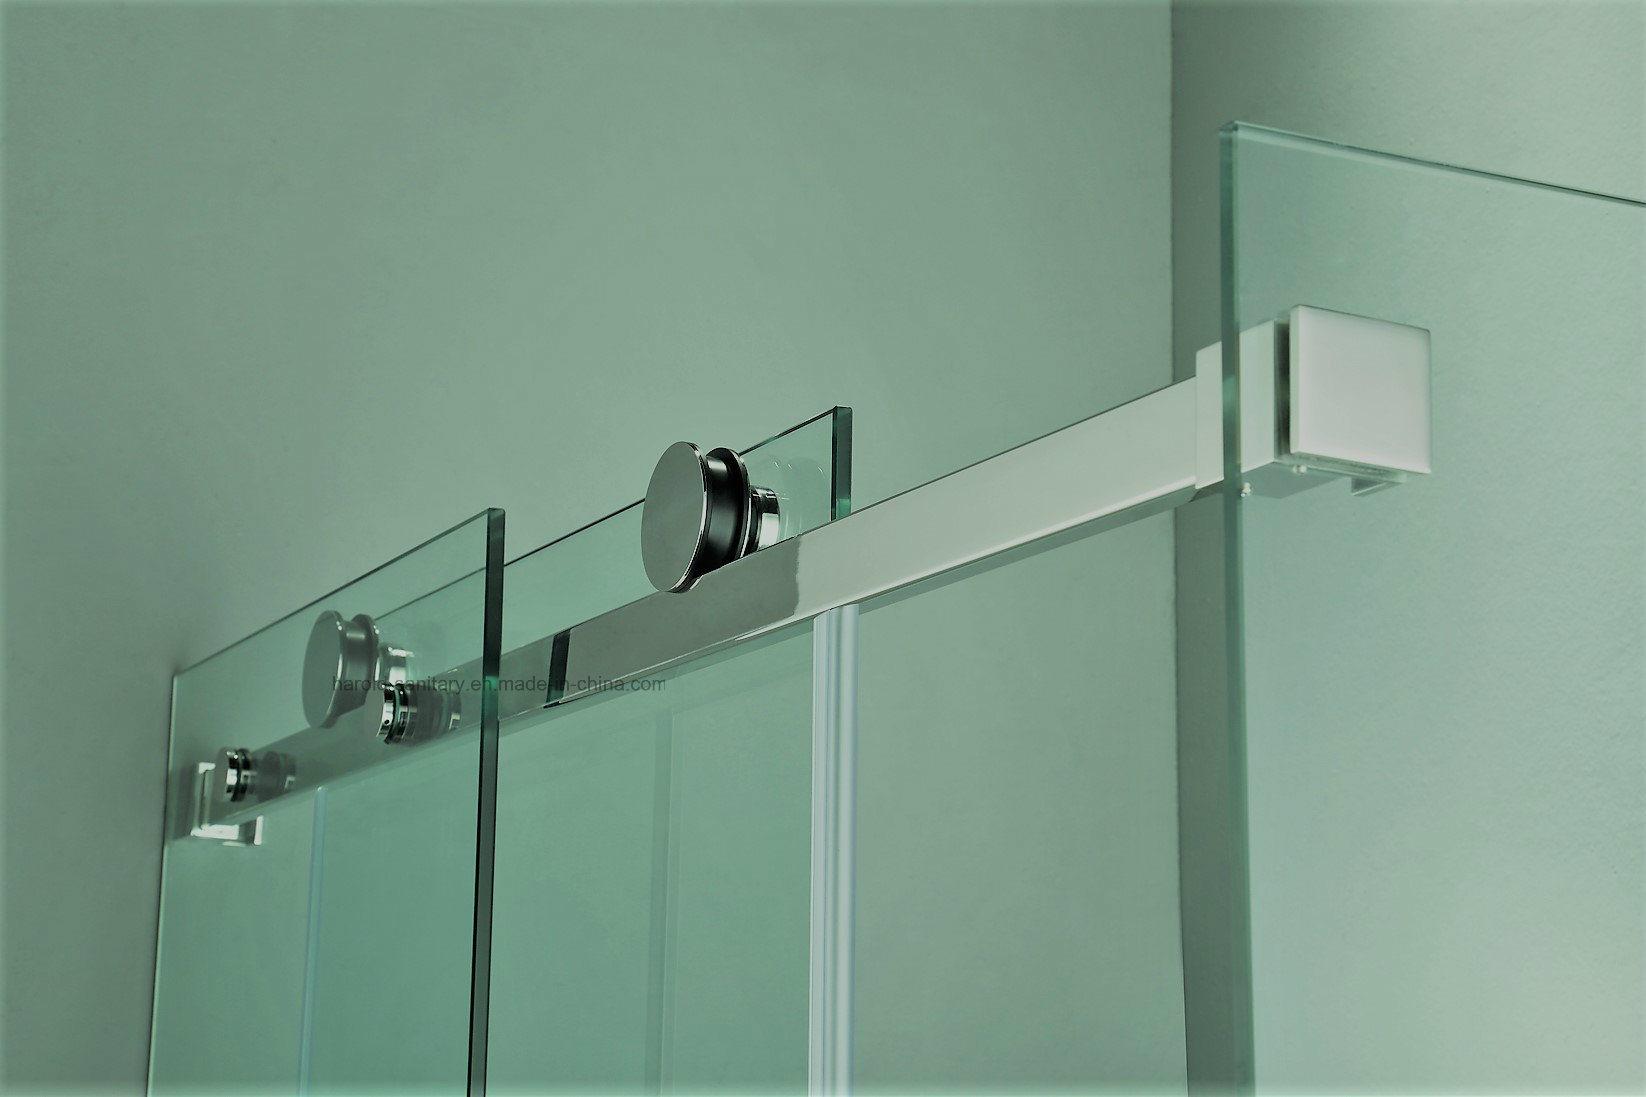 HR-P031-D Heavy-Duty Straight Sliding Shower Door